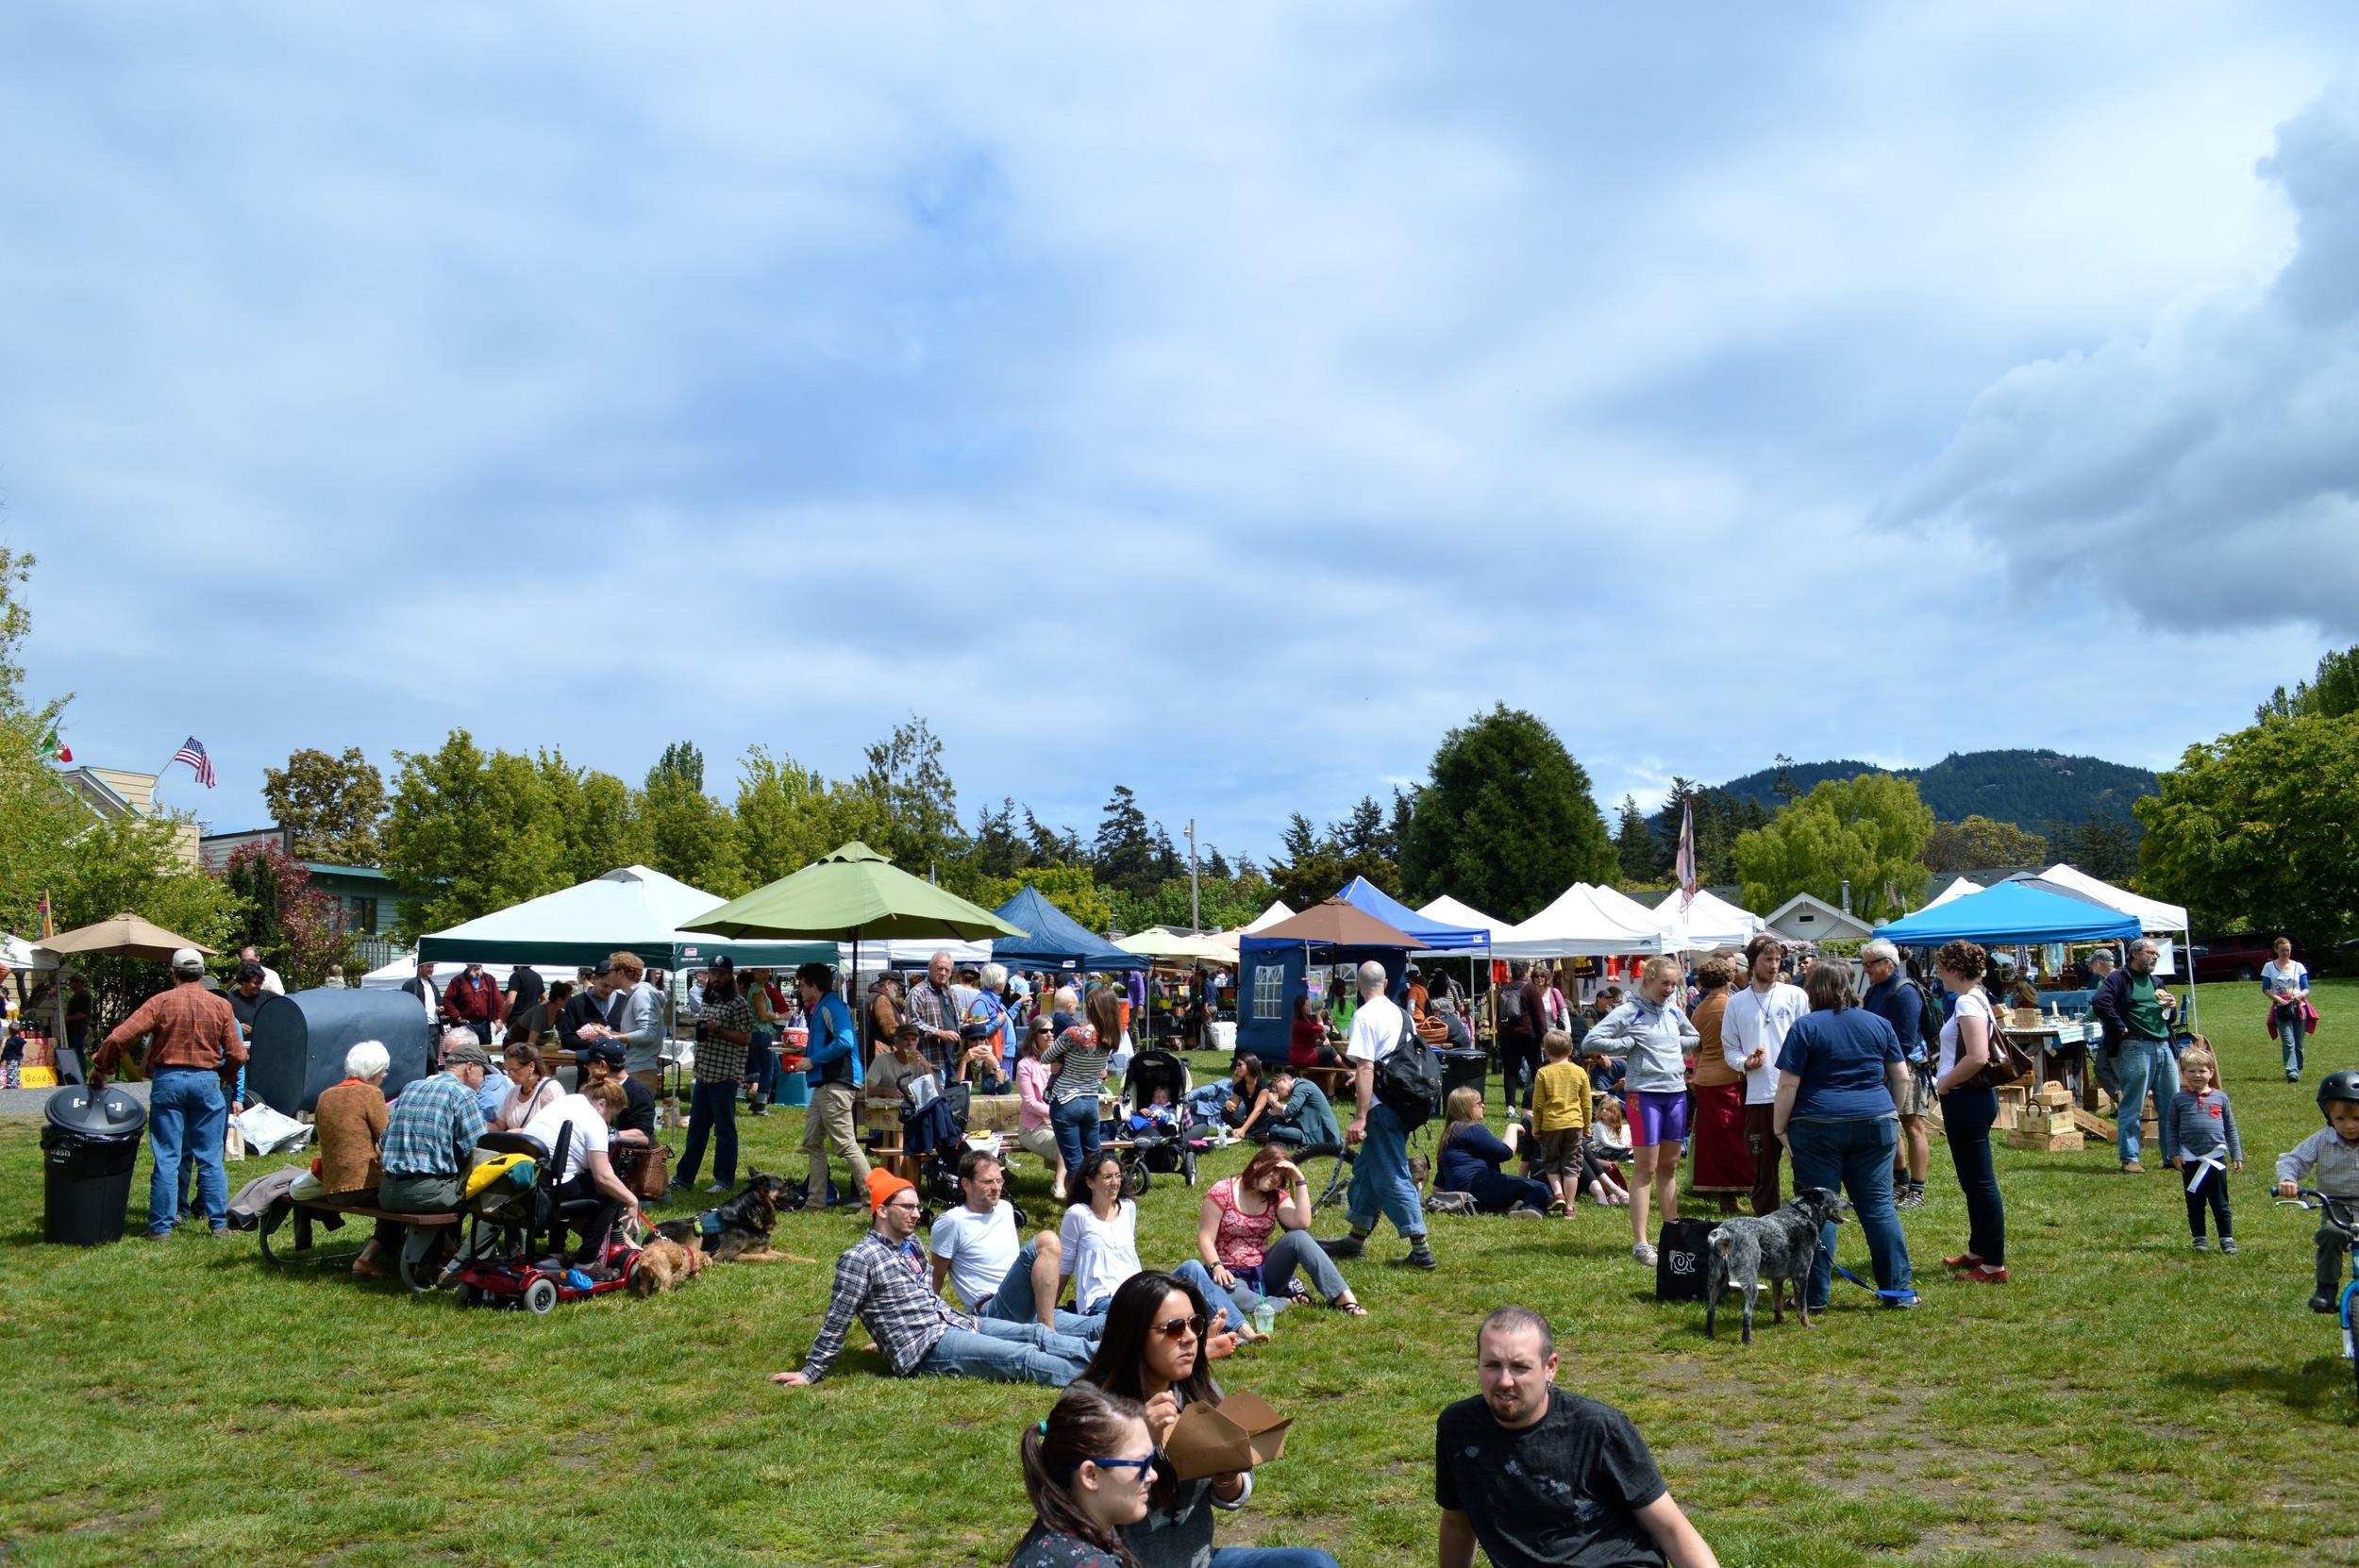 Saturday Farmers Market @ the Village Green - Orcas Island